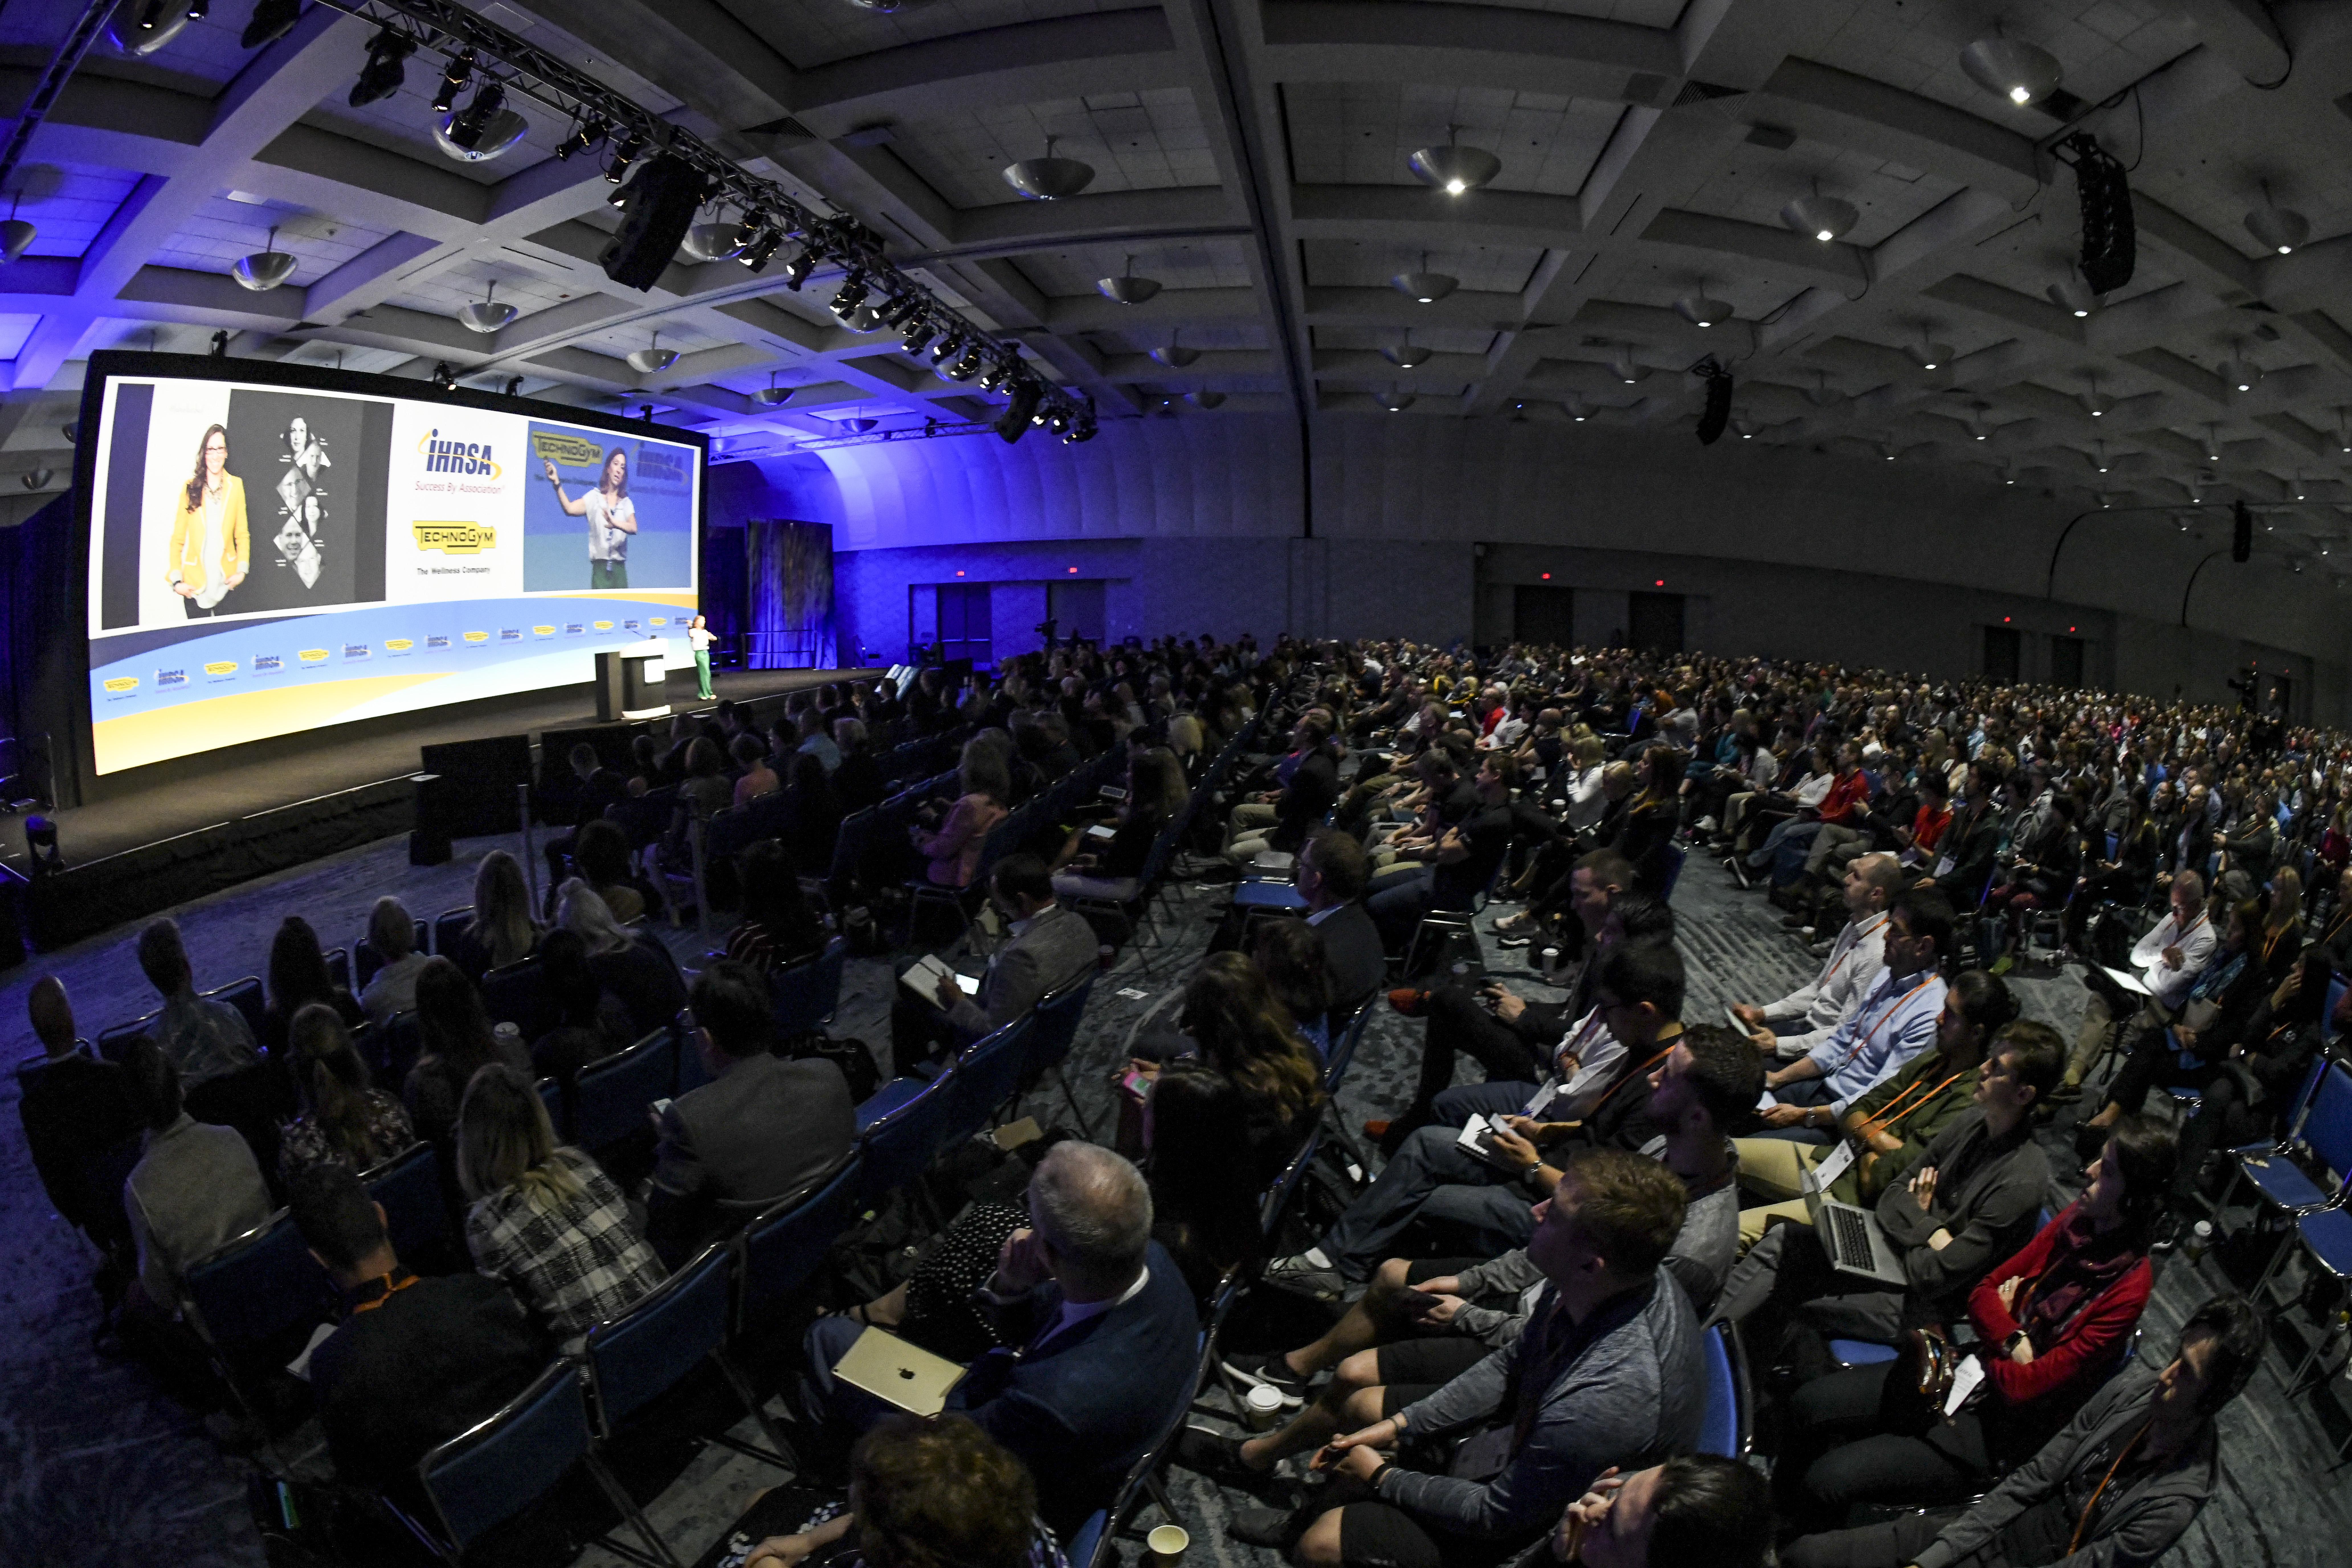 IHRSA2018_Keynote Session_room.jpg